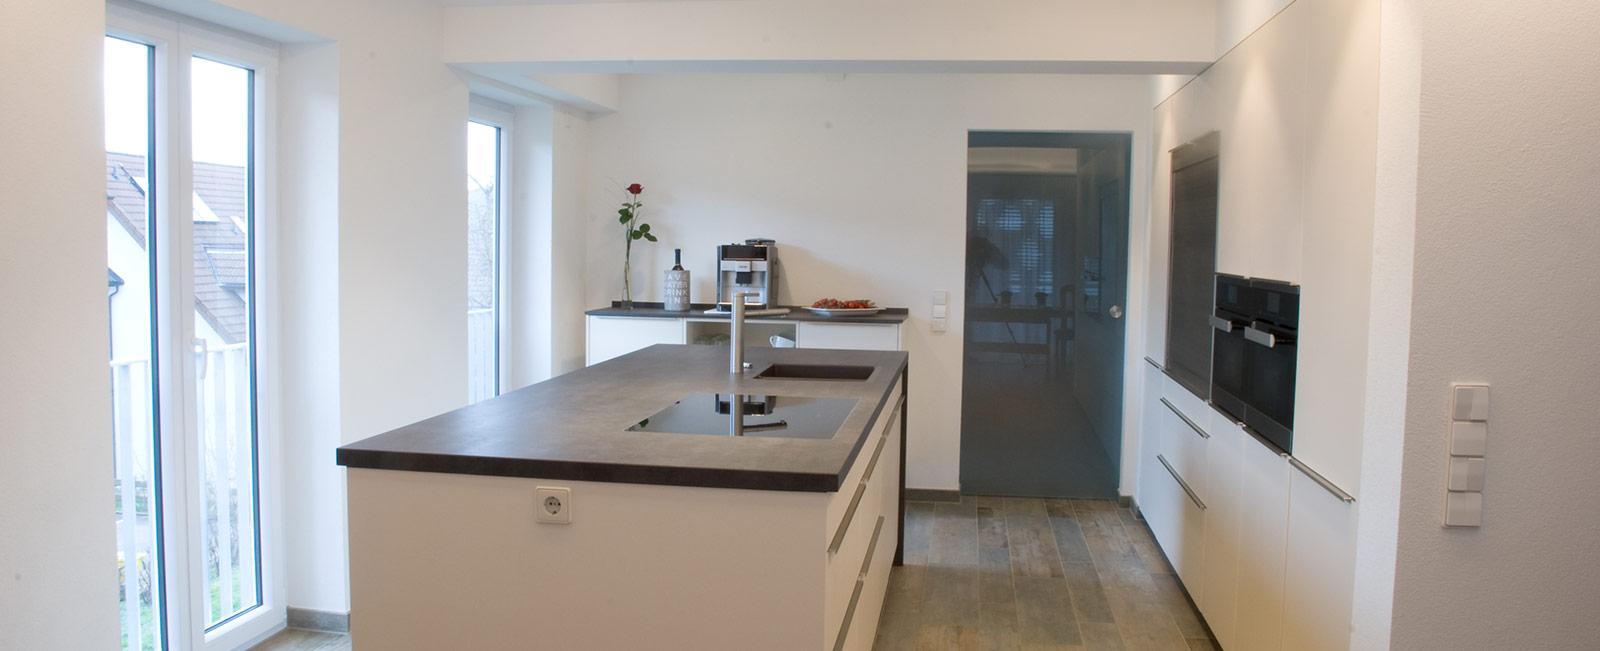 grifflose k che in wei matt. Black Bedroom Furniture Sets. Home Design Ideas